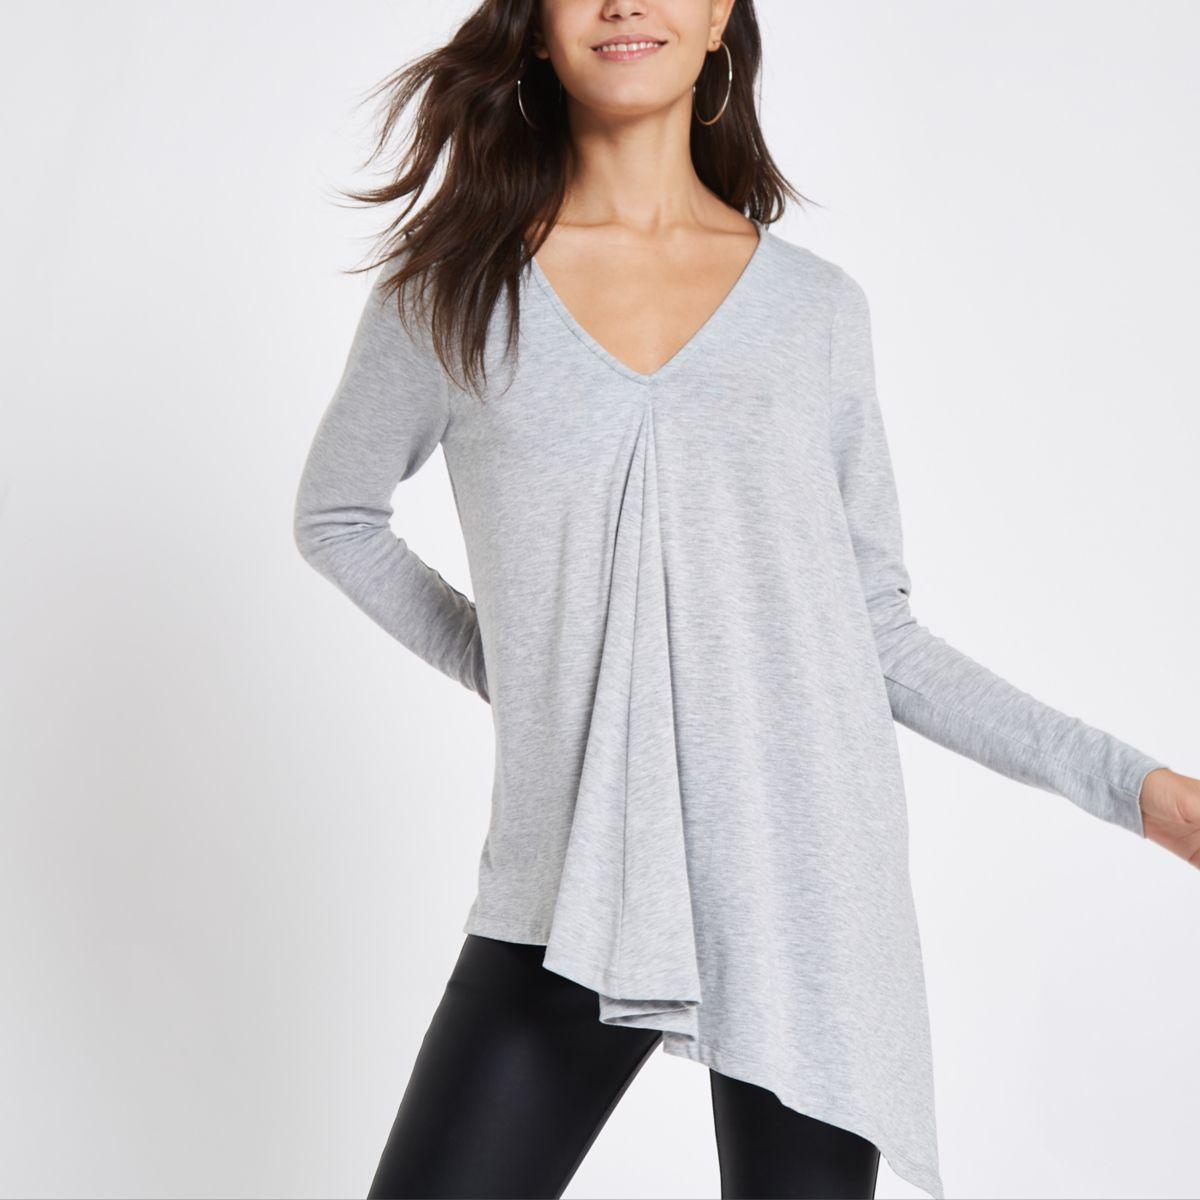 Light grey long sleeve drape top